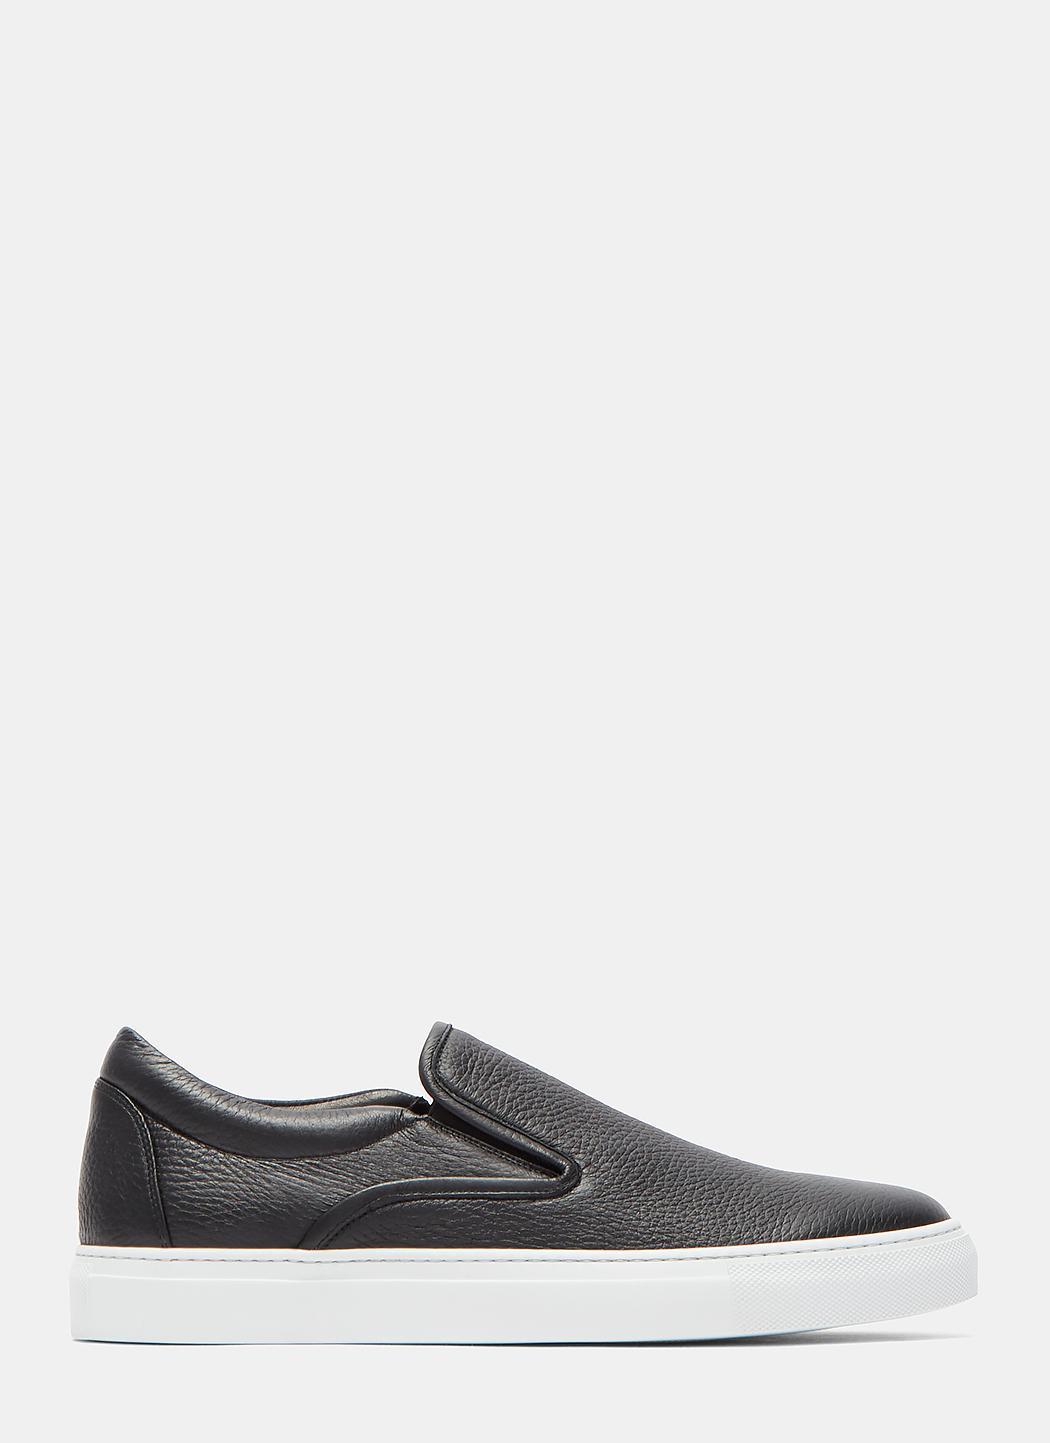 AIEZEN Slip-On Grained Leather Sneakers